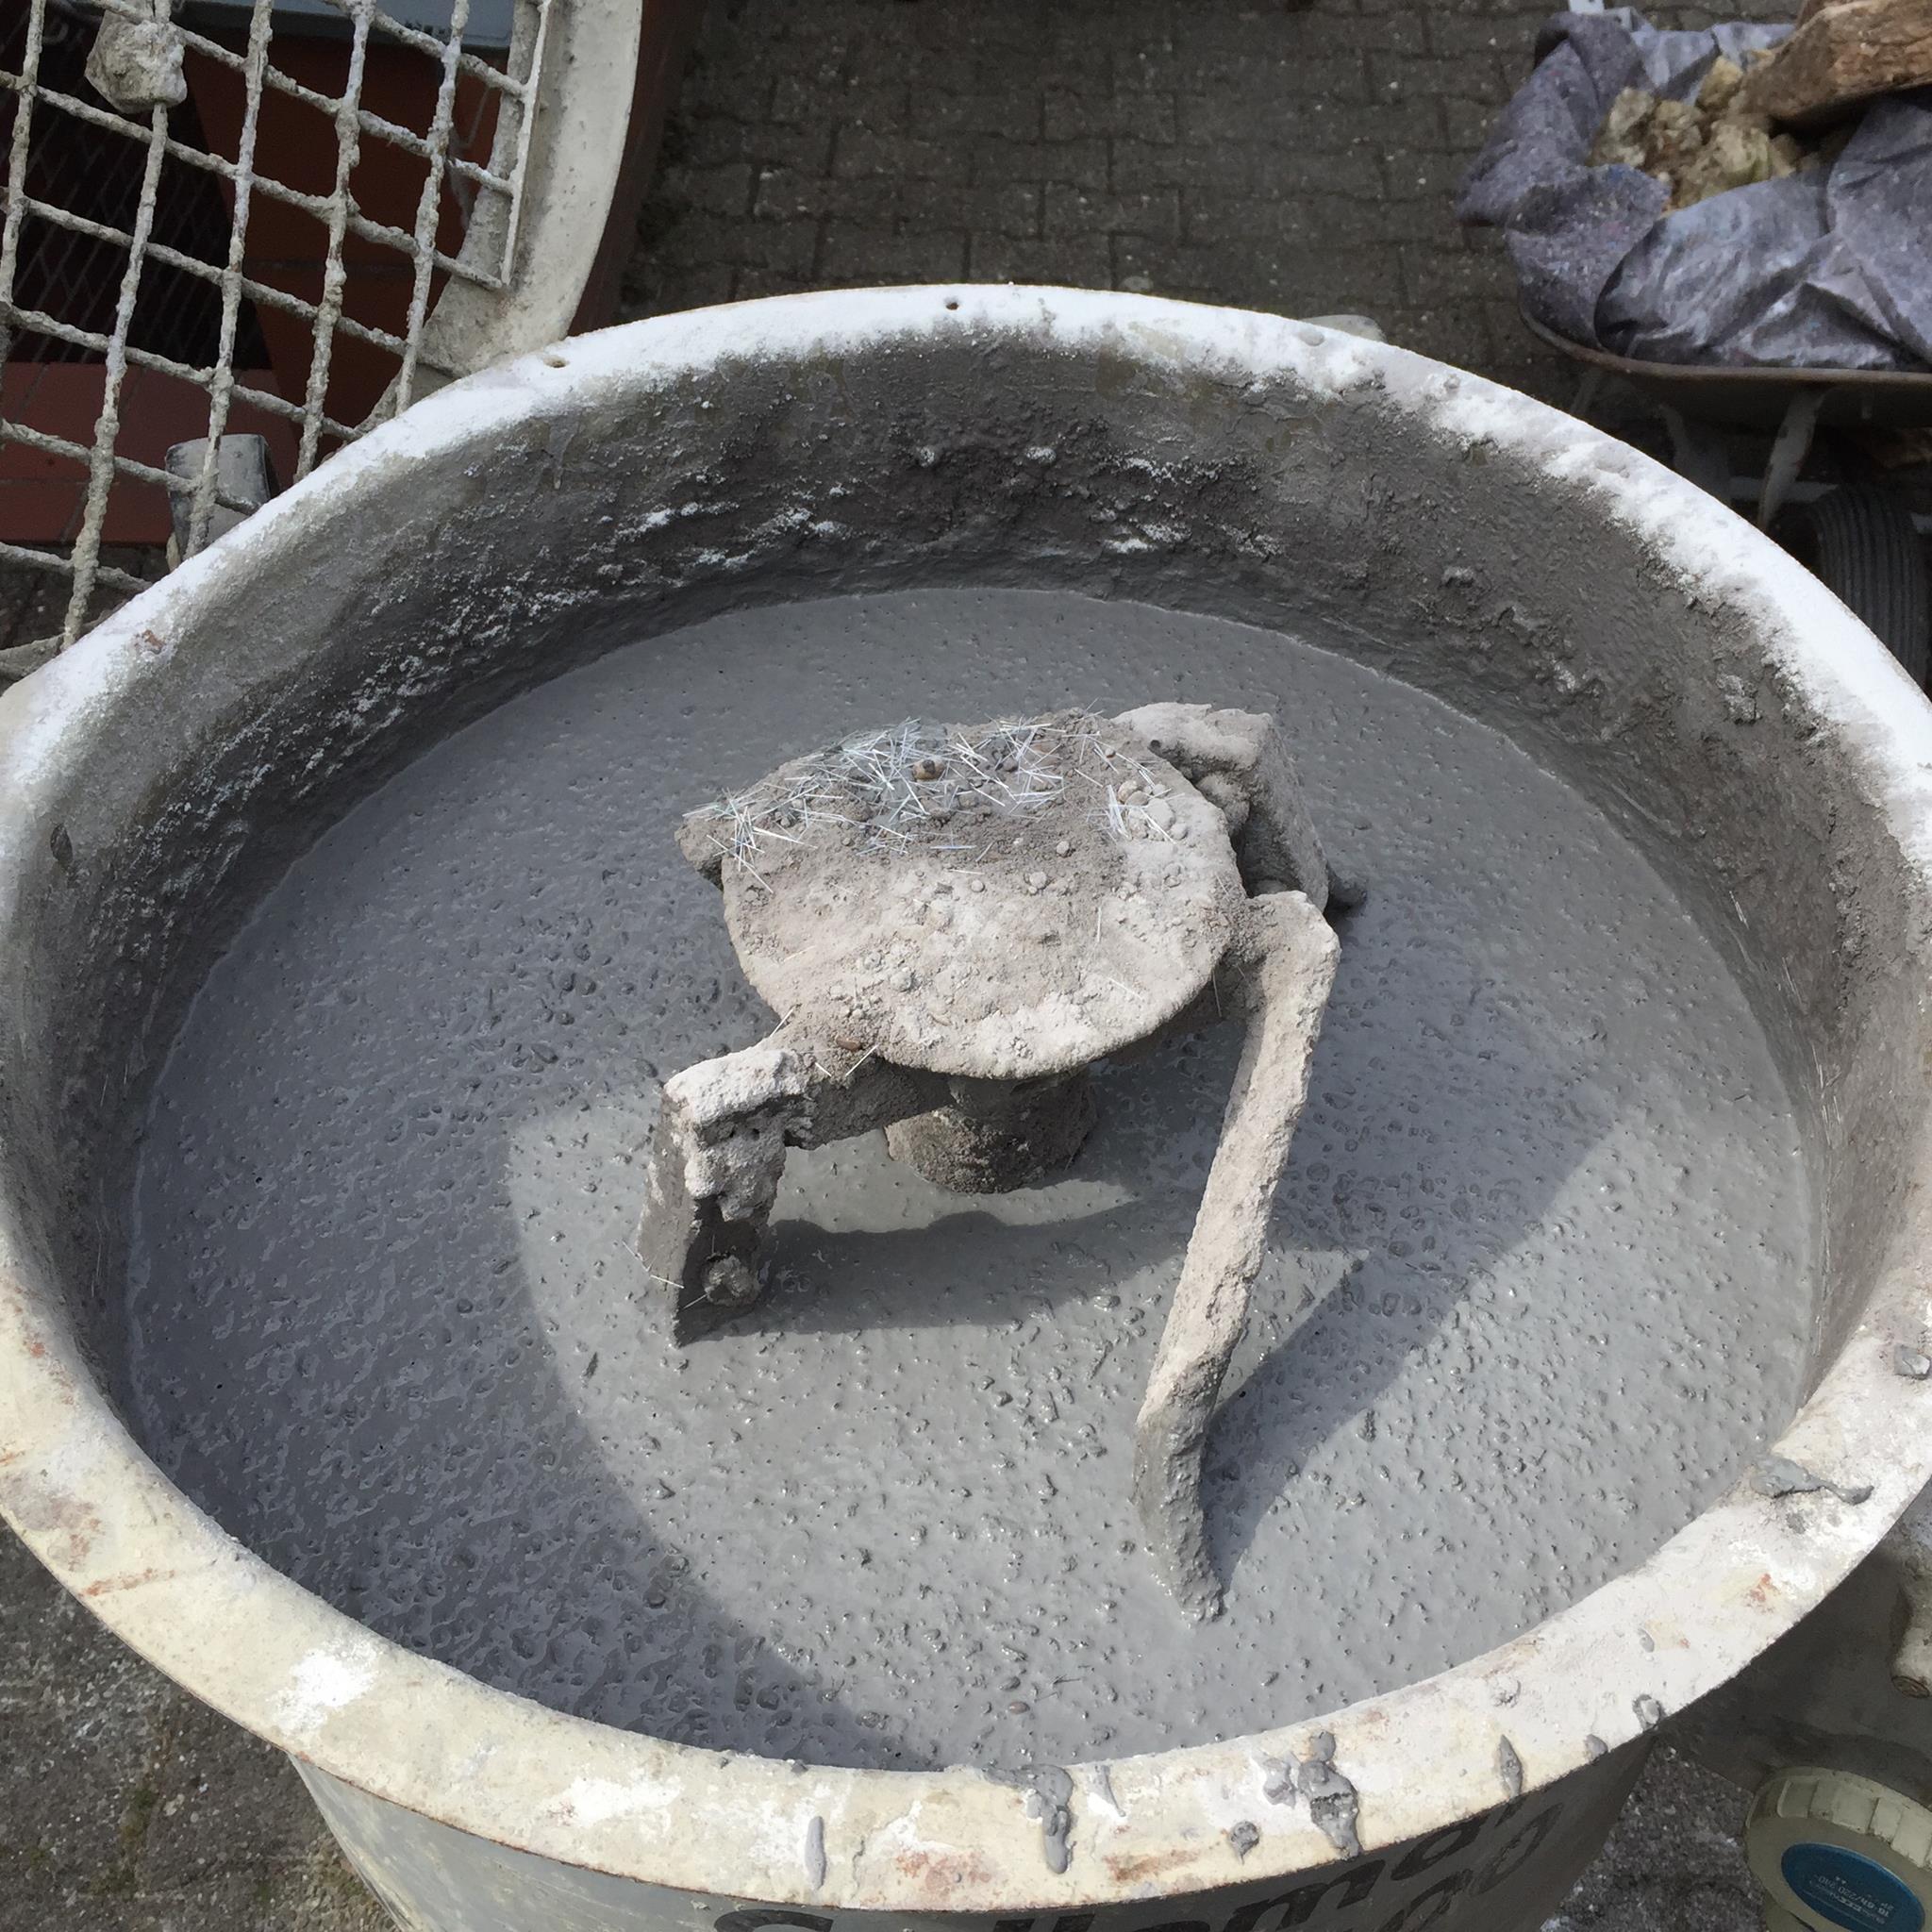 arbeitsplatten aus beton diy anleitung mit betonrezept bigmeatlove. Black Bedroom Furniture Sets. Home Design Ideas